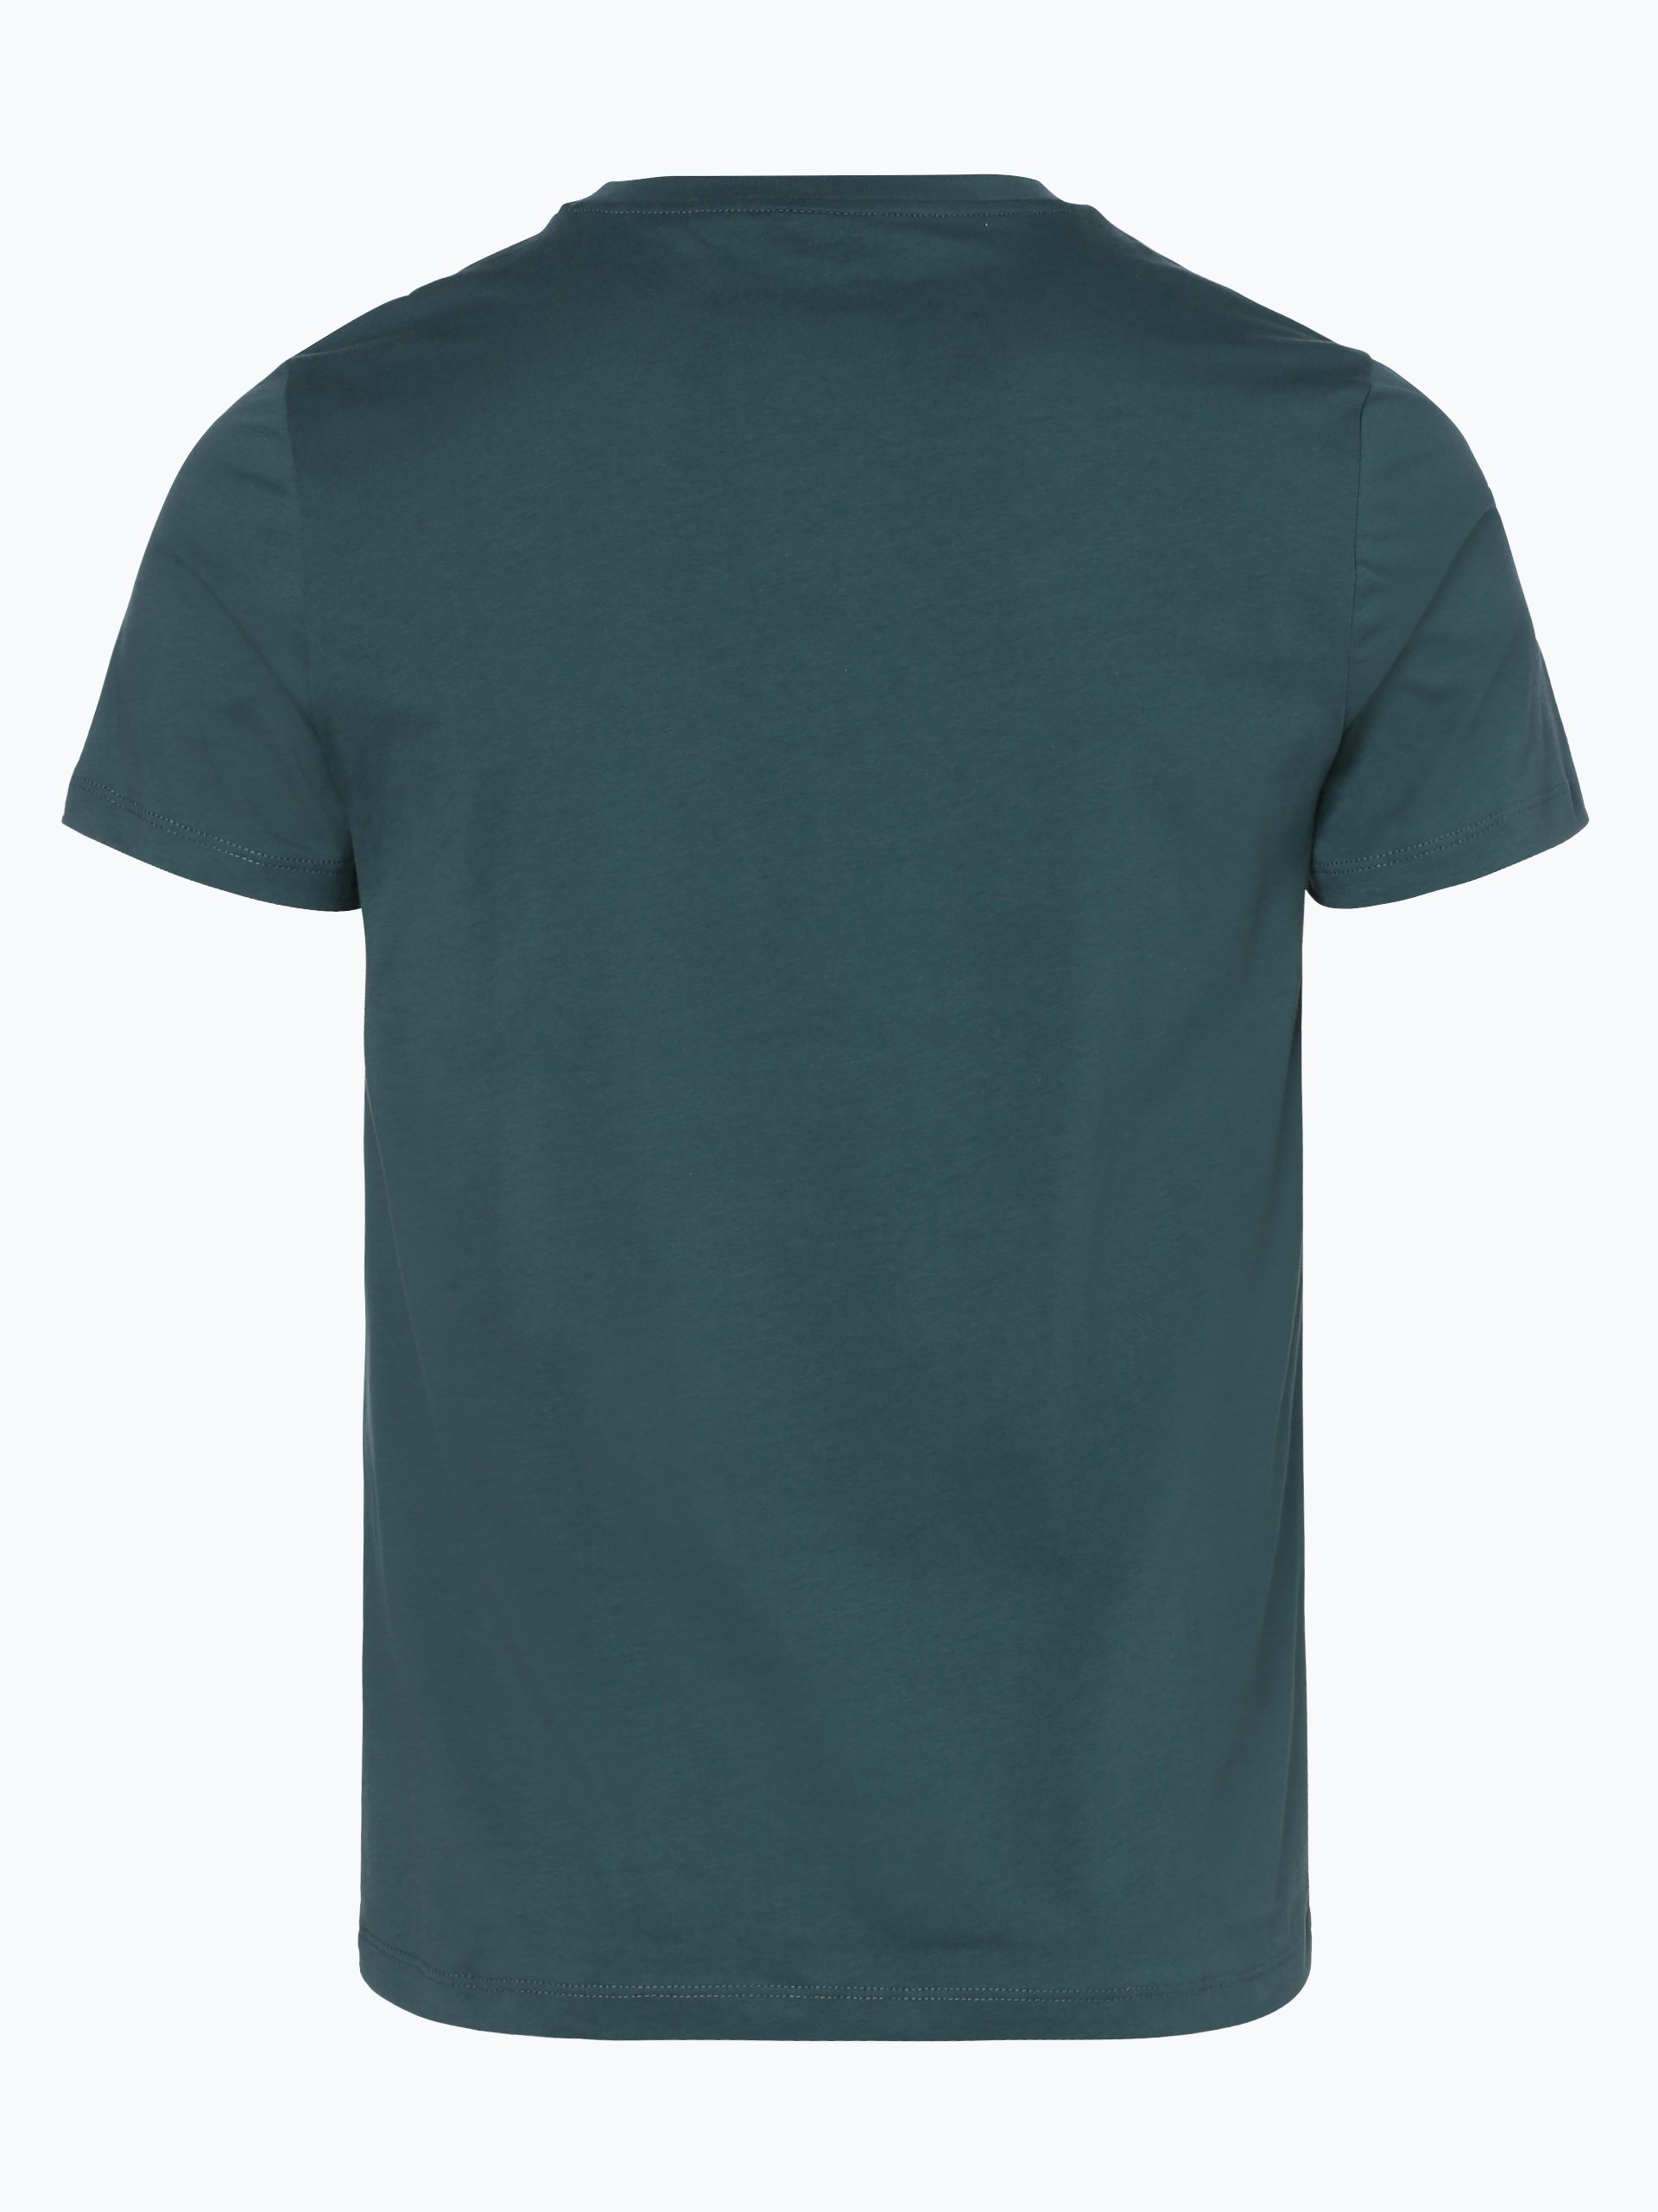 boss casual herren t shirt topwork 1 khaki tanne. Black Bedroom Furniture Sets. Home Design Ideas